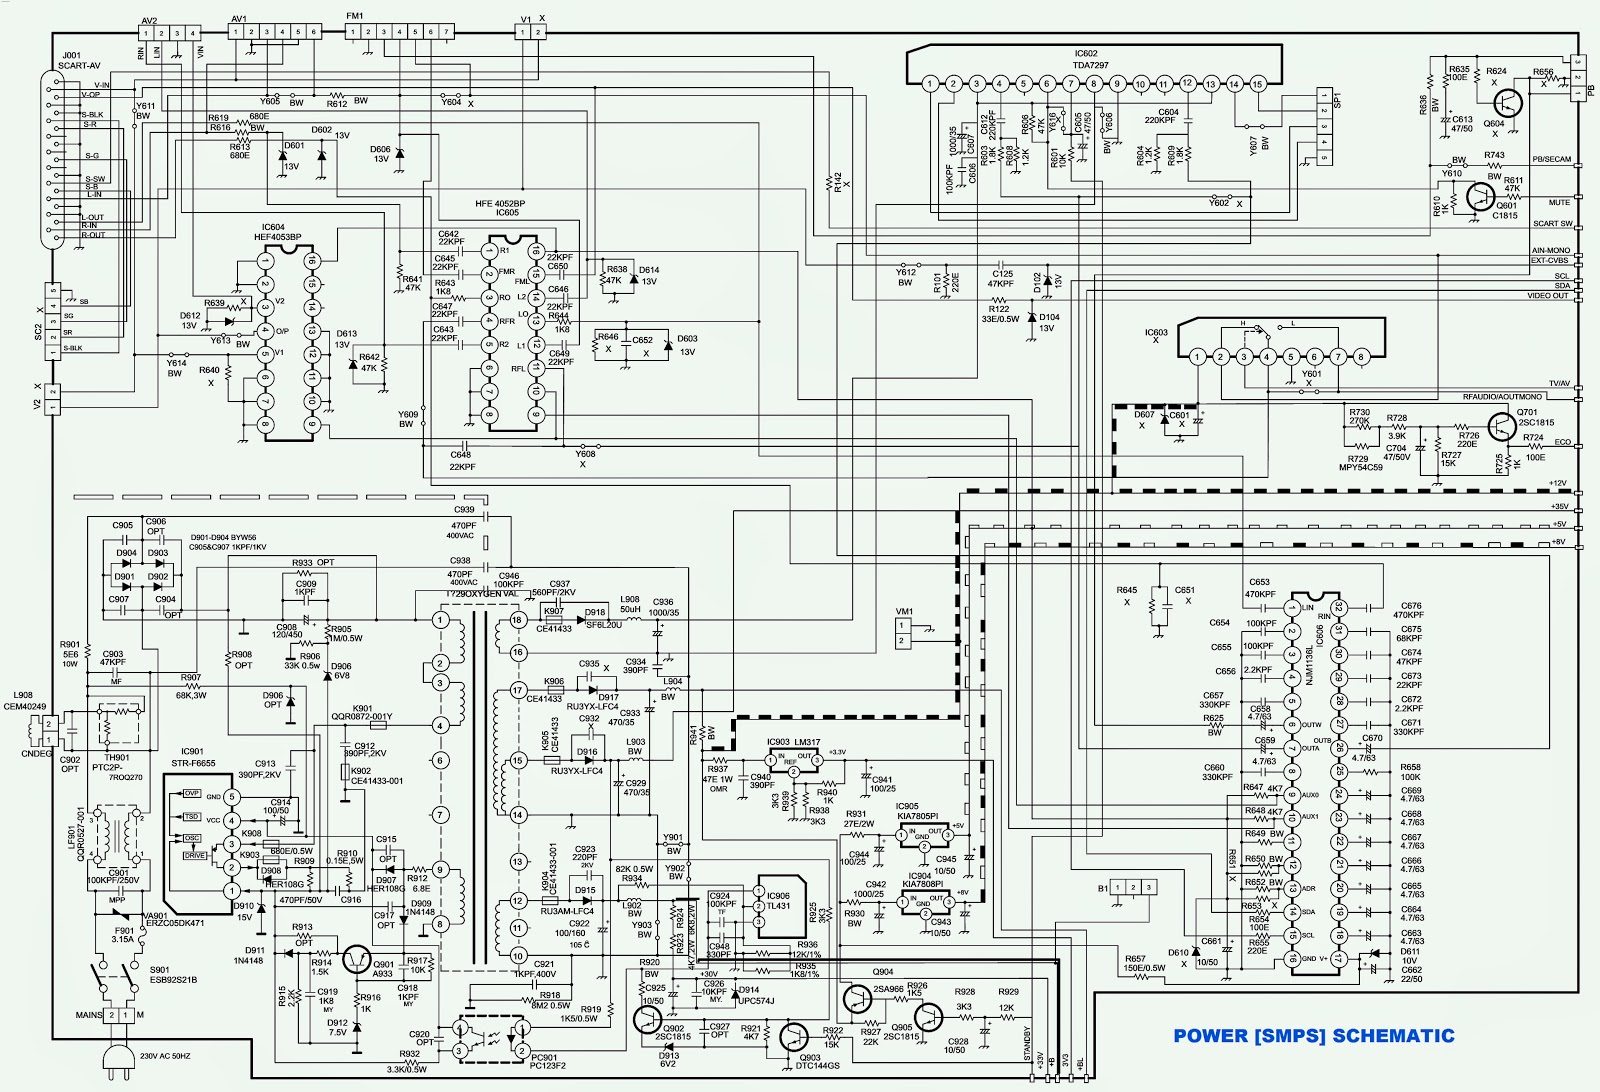 lg tv schematic diagram wiring diagram now rh 16 opqws madeagleband de